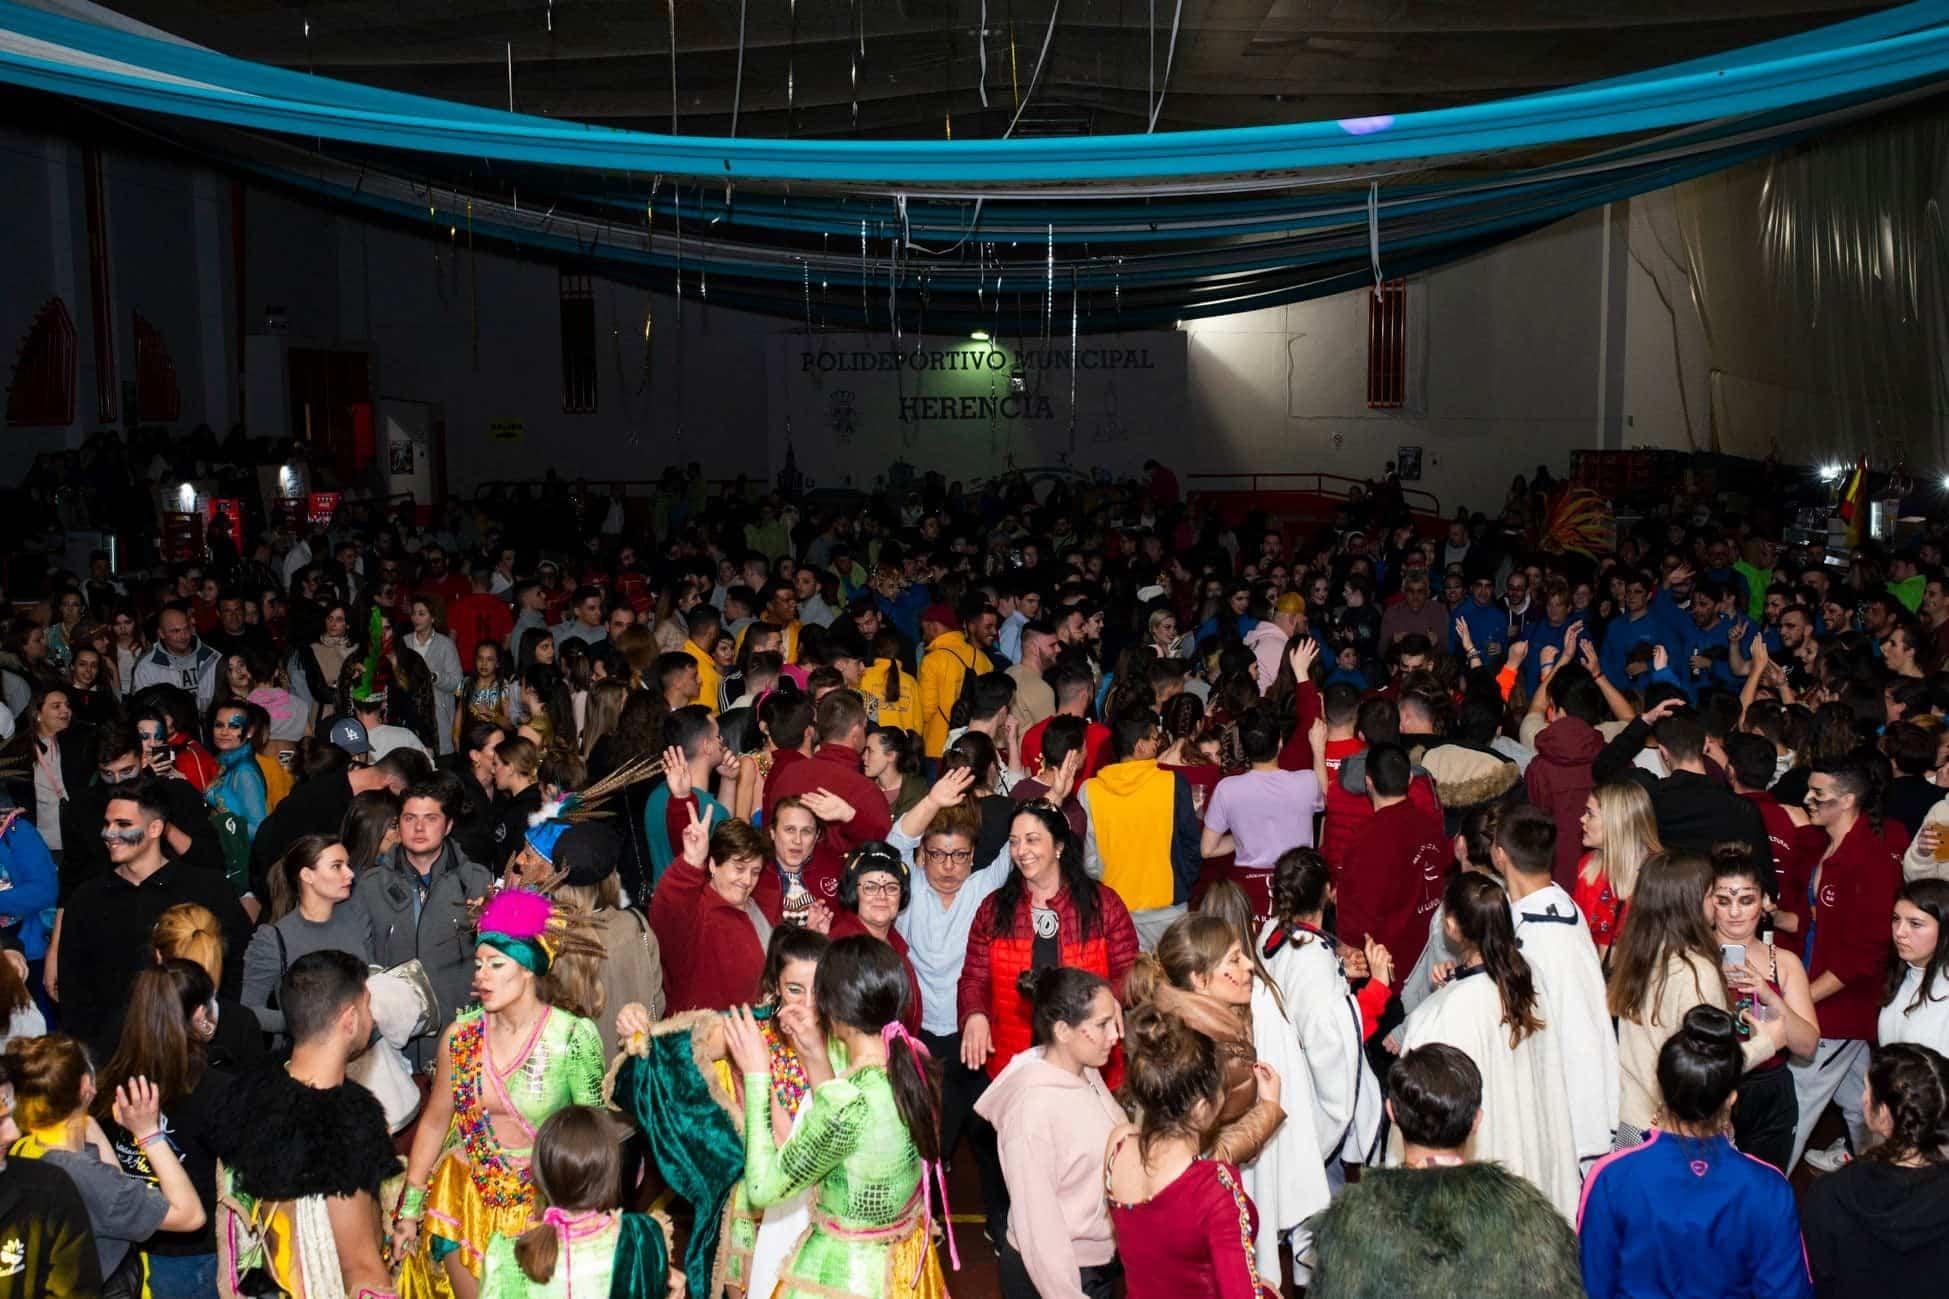 Carnaval de herencia 2020 ofertorio 171 - Selección de fotografías del Ofertorio del Carnaval de Herencia